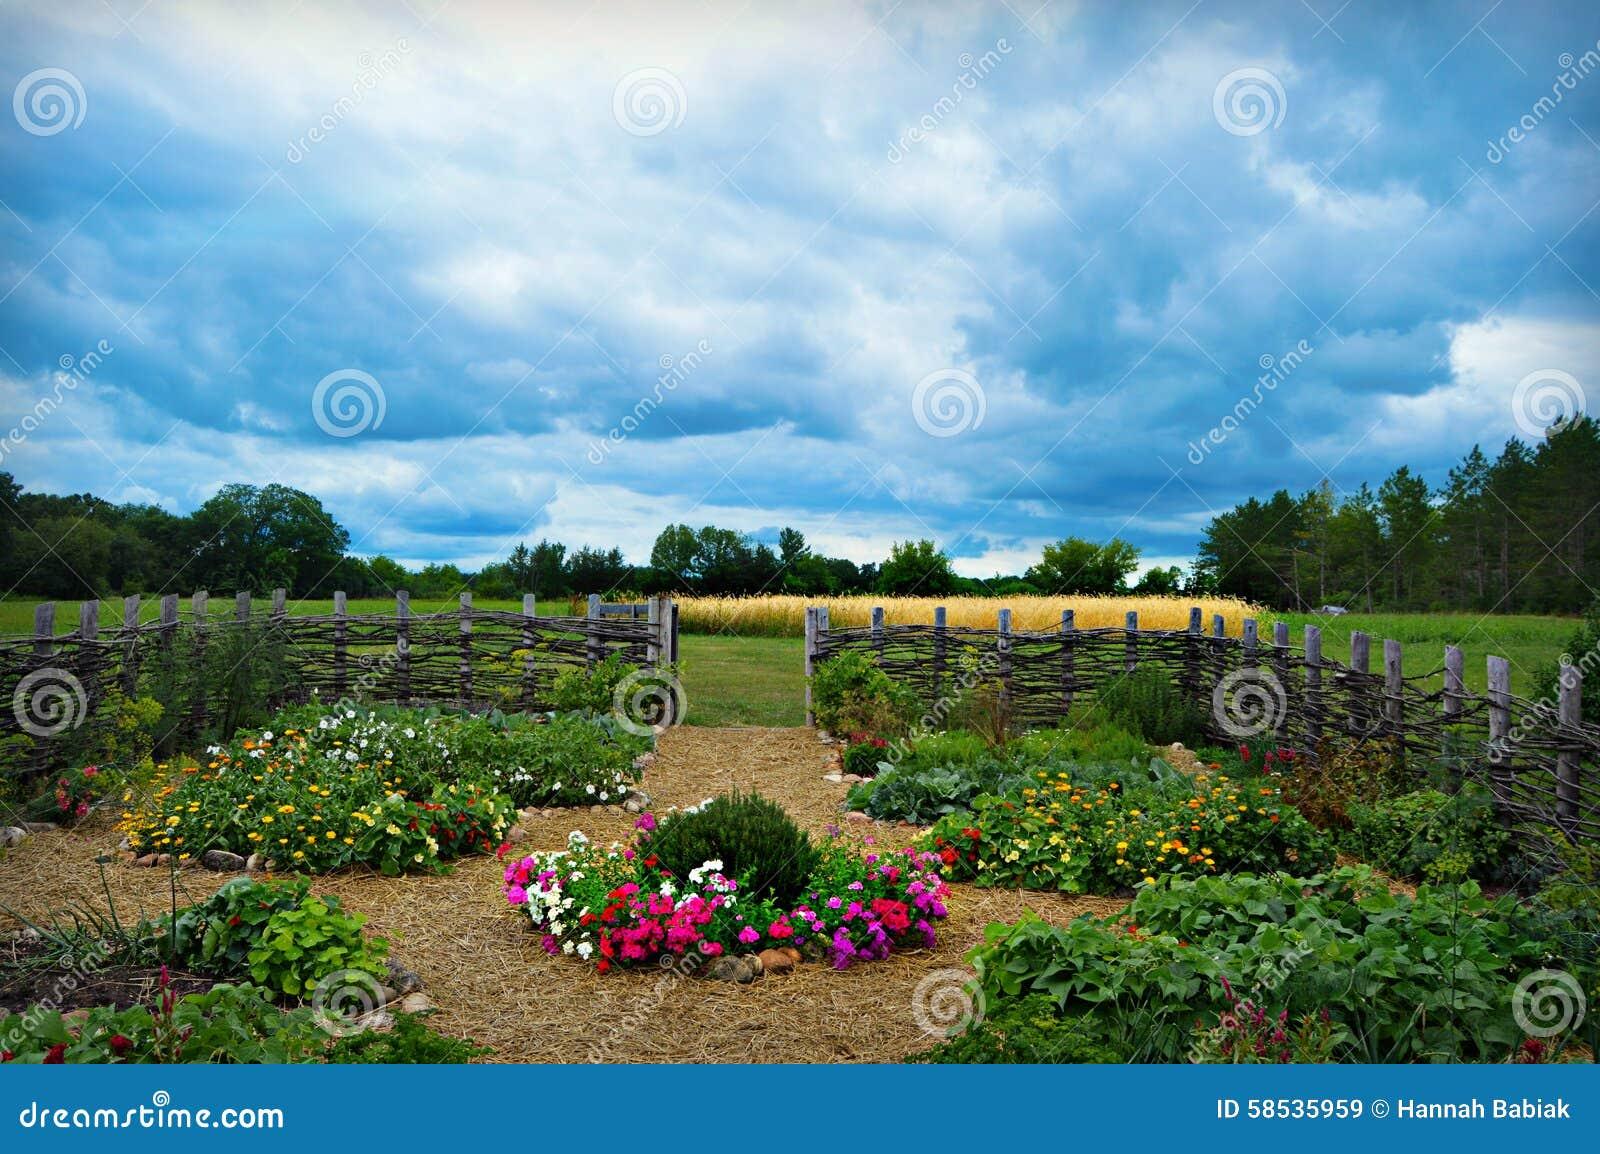 Beautiful vegetable garden fence - Beautiful Cloudy Day Fence Field Flower Garden